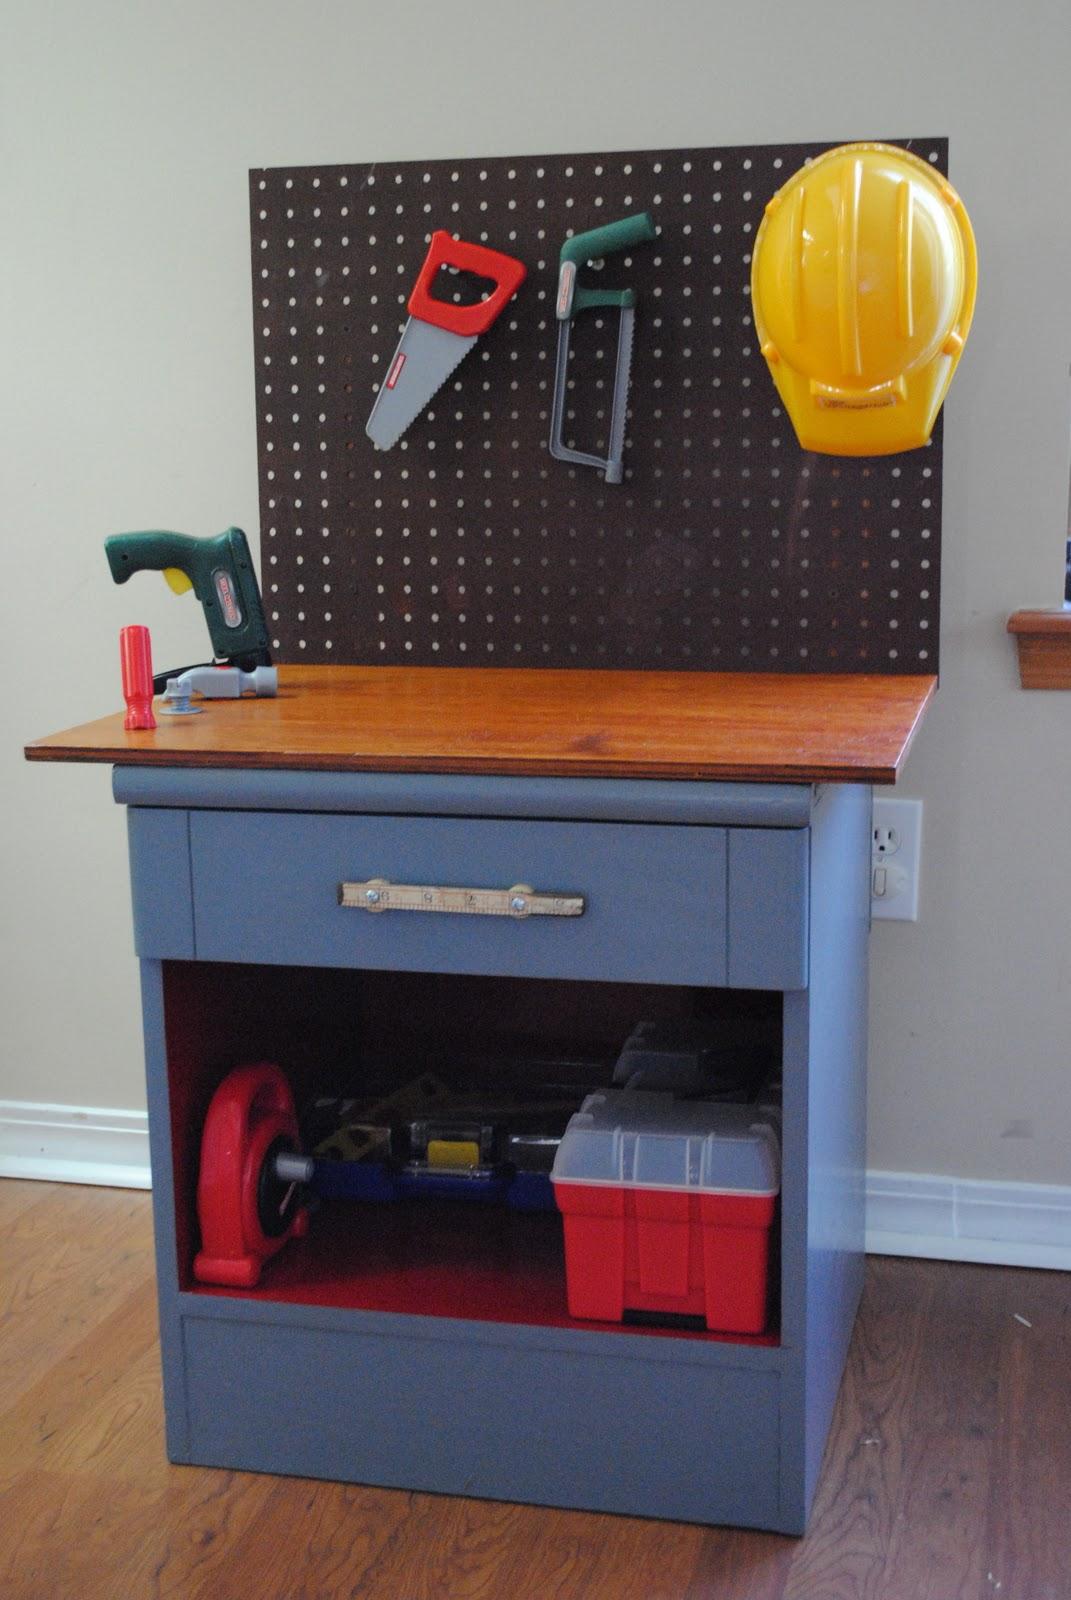 Details about black and decker jr power work bench junior tool set